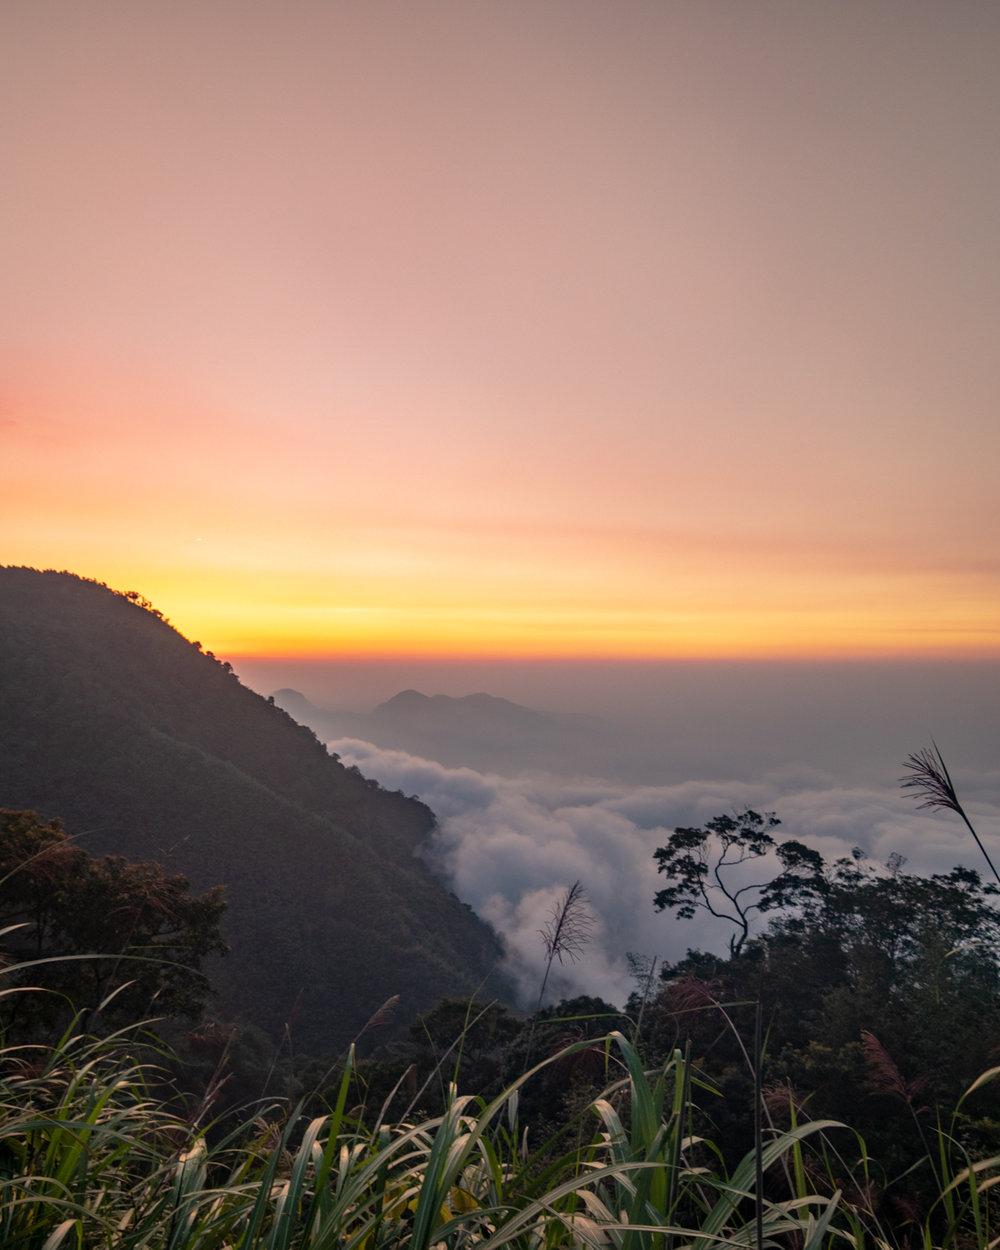 Sunset on the Fenrui Trail